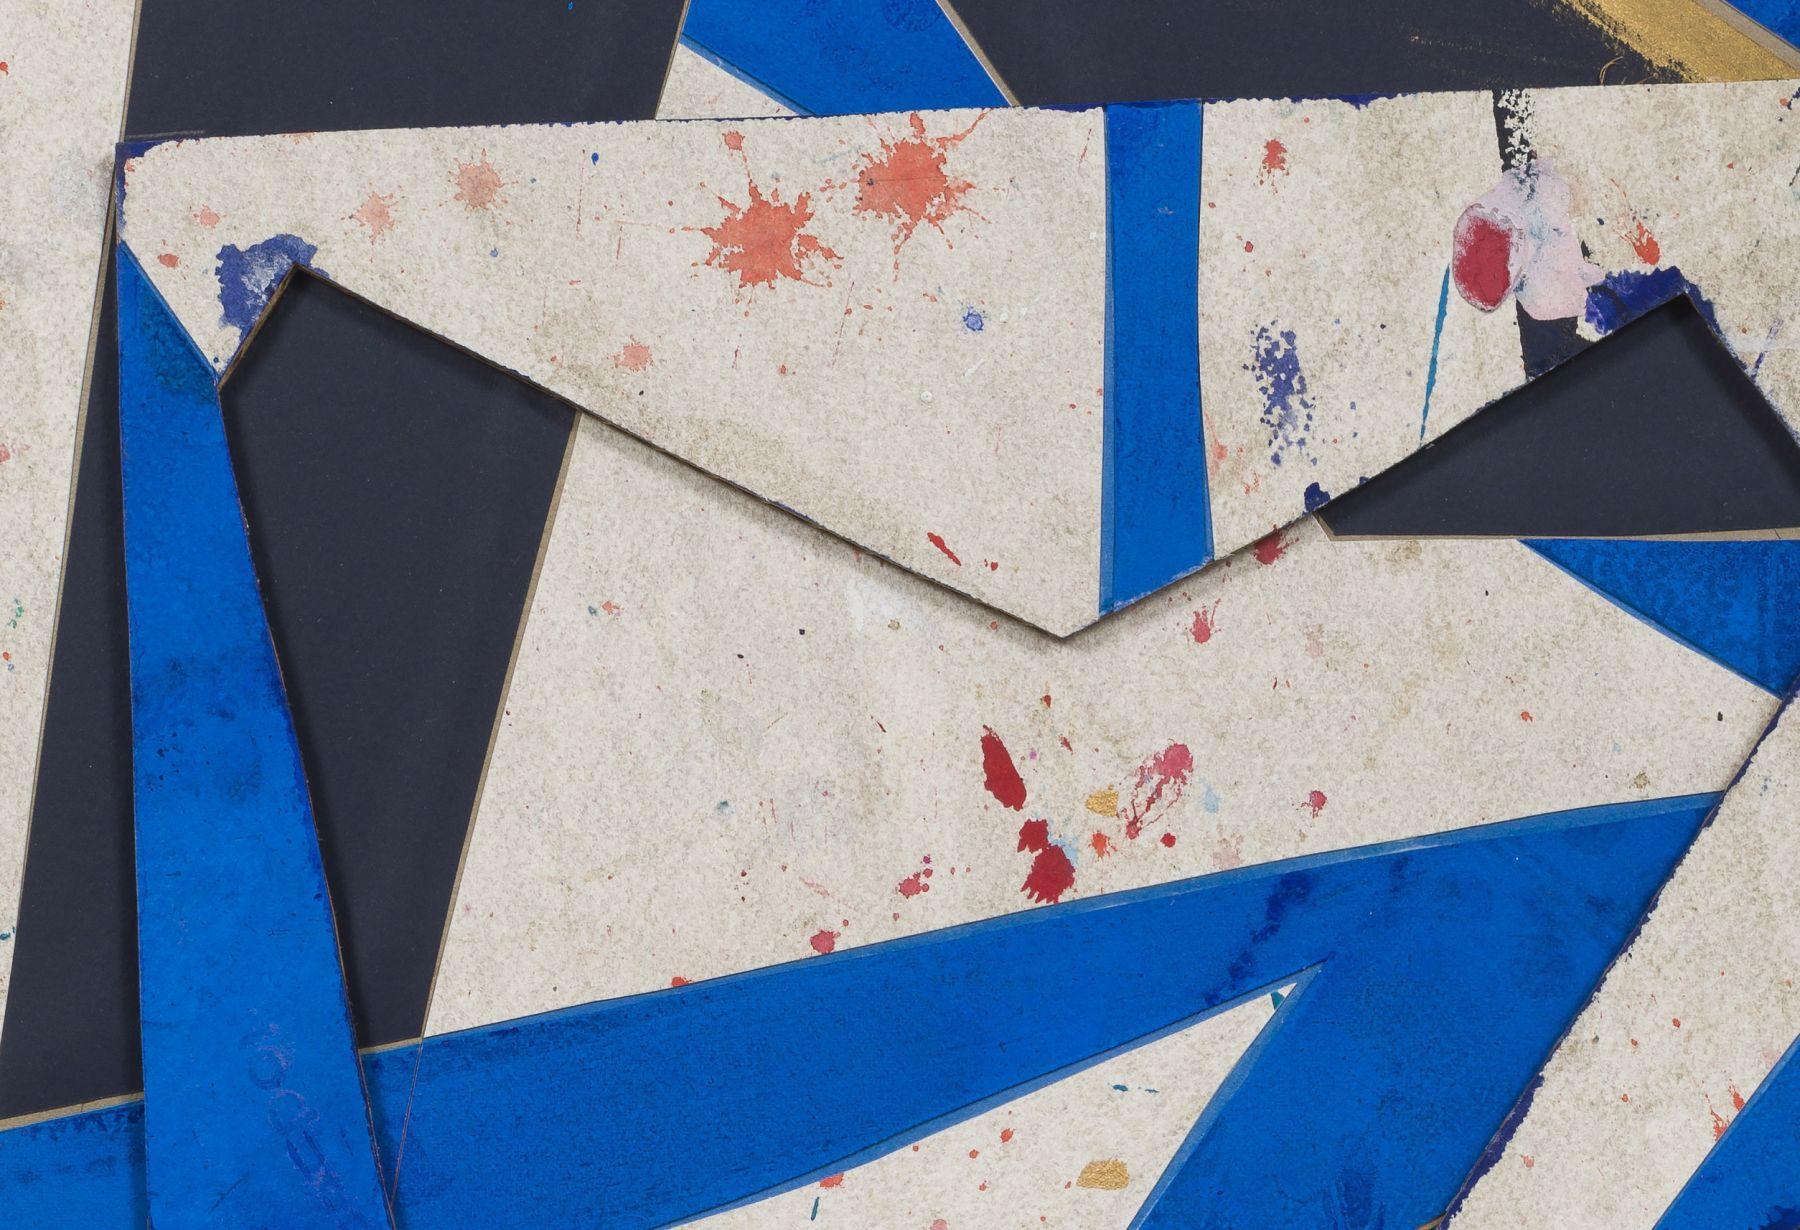 Detail ofUntitled (bl.wht.flr.ppr.bl.wht.crdbrd.), 2016, Gouache, graphite, glue, paper, cardboard, aluminum and wood panel